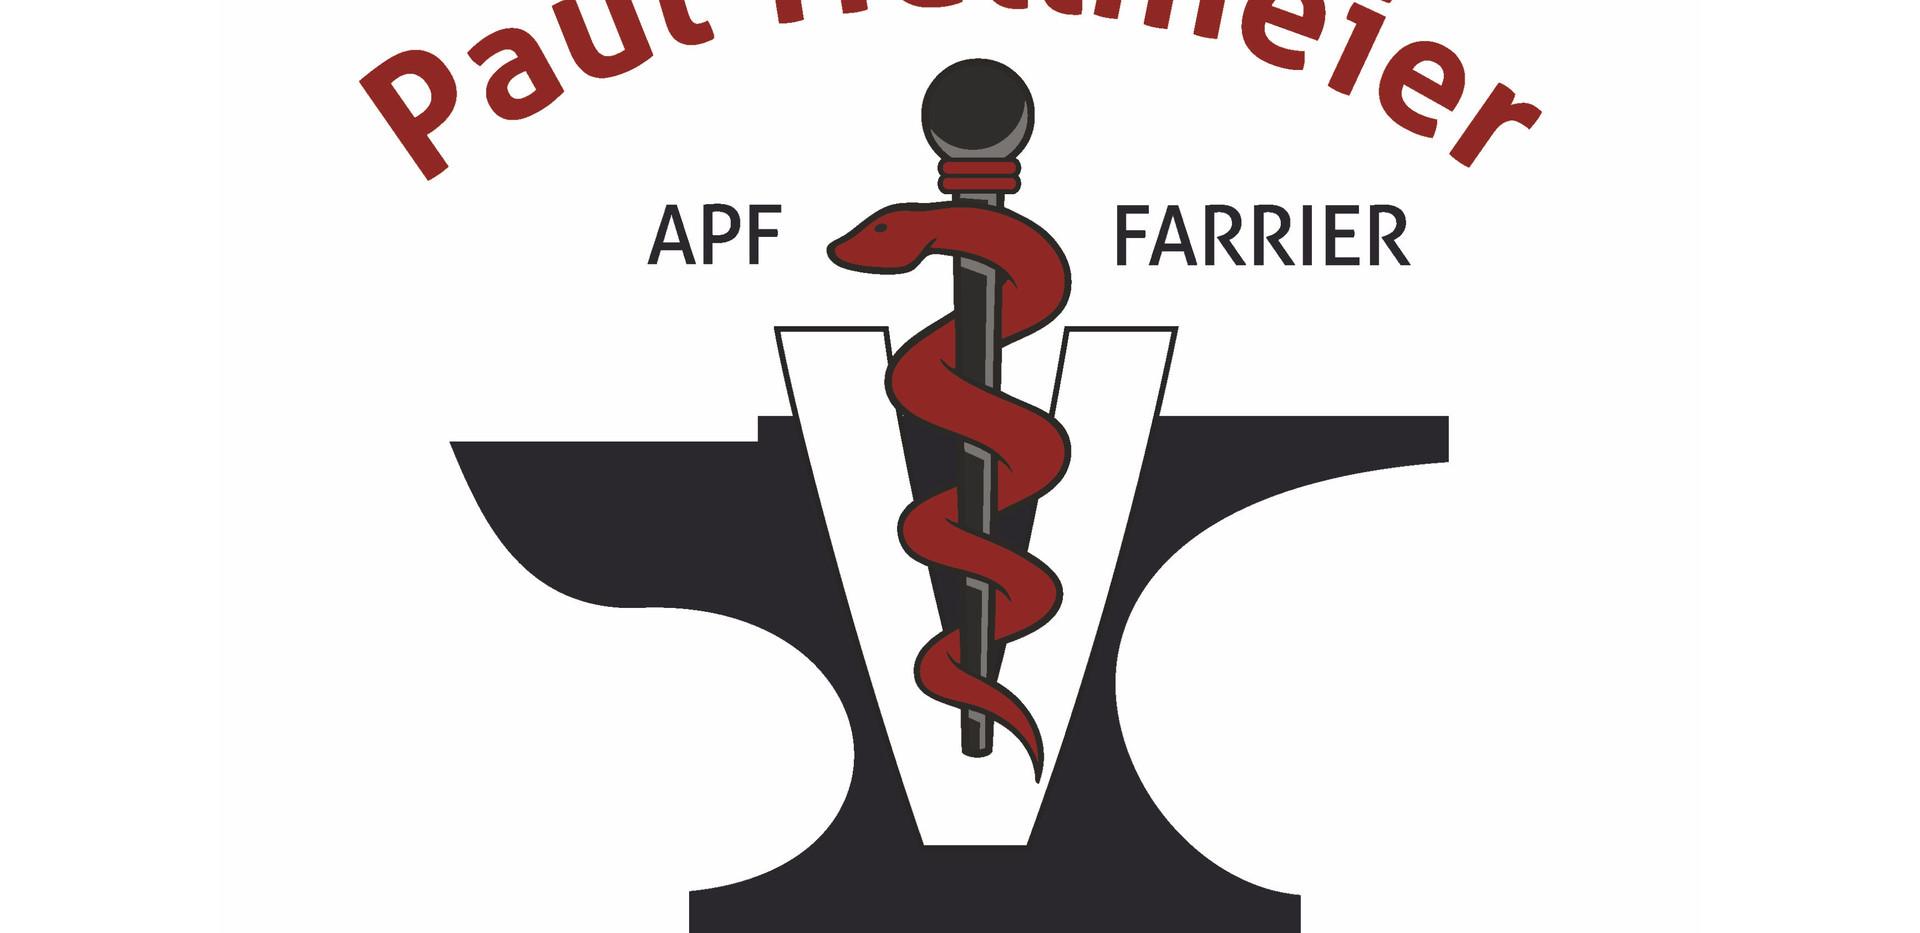 Logoentwicklung, Fahrzeugbeschriftung, Werbemittel für Hufschmied